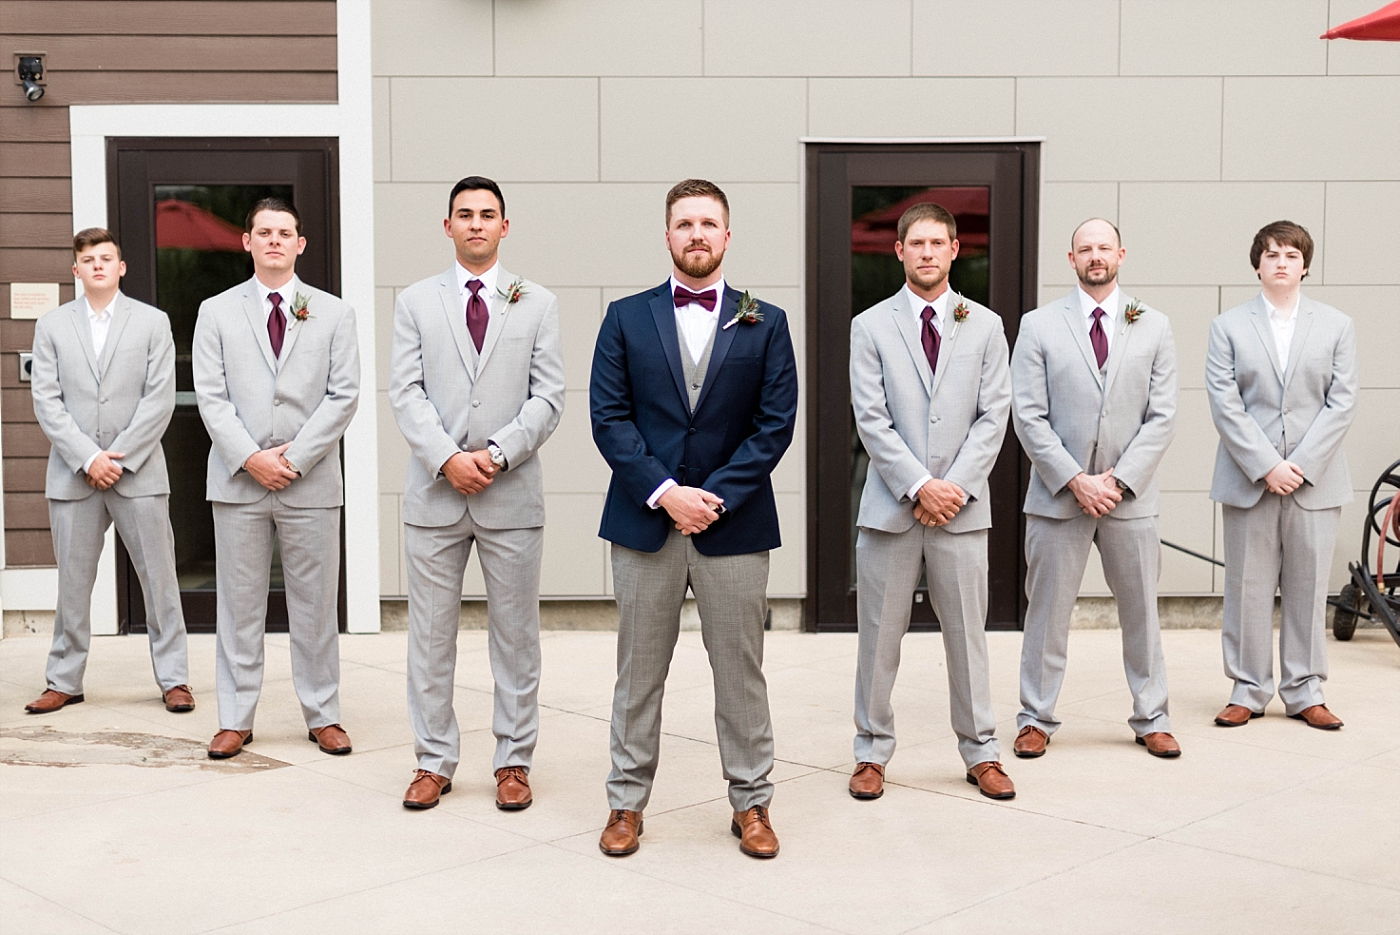 Groom groomsmen wedding church details